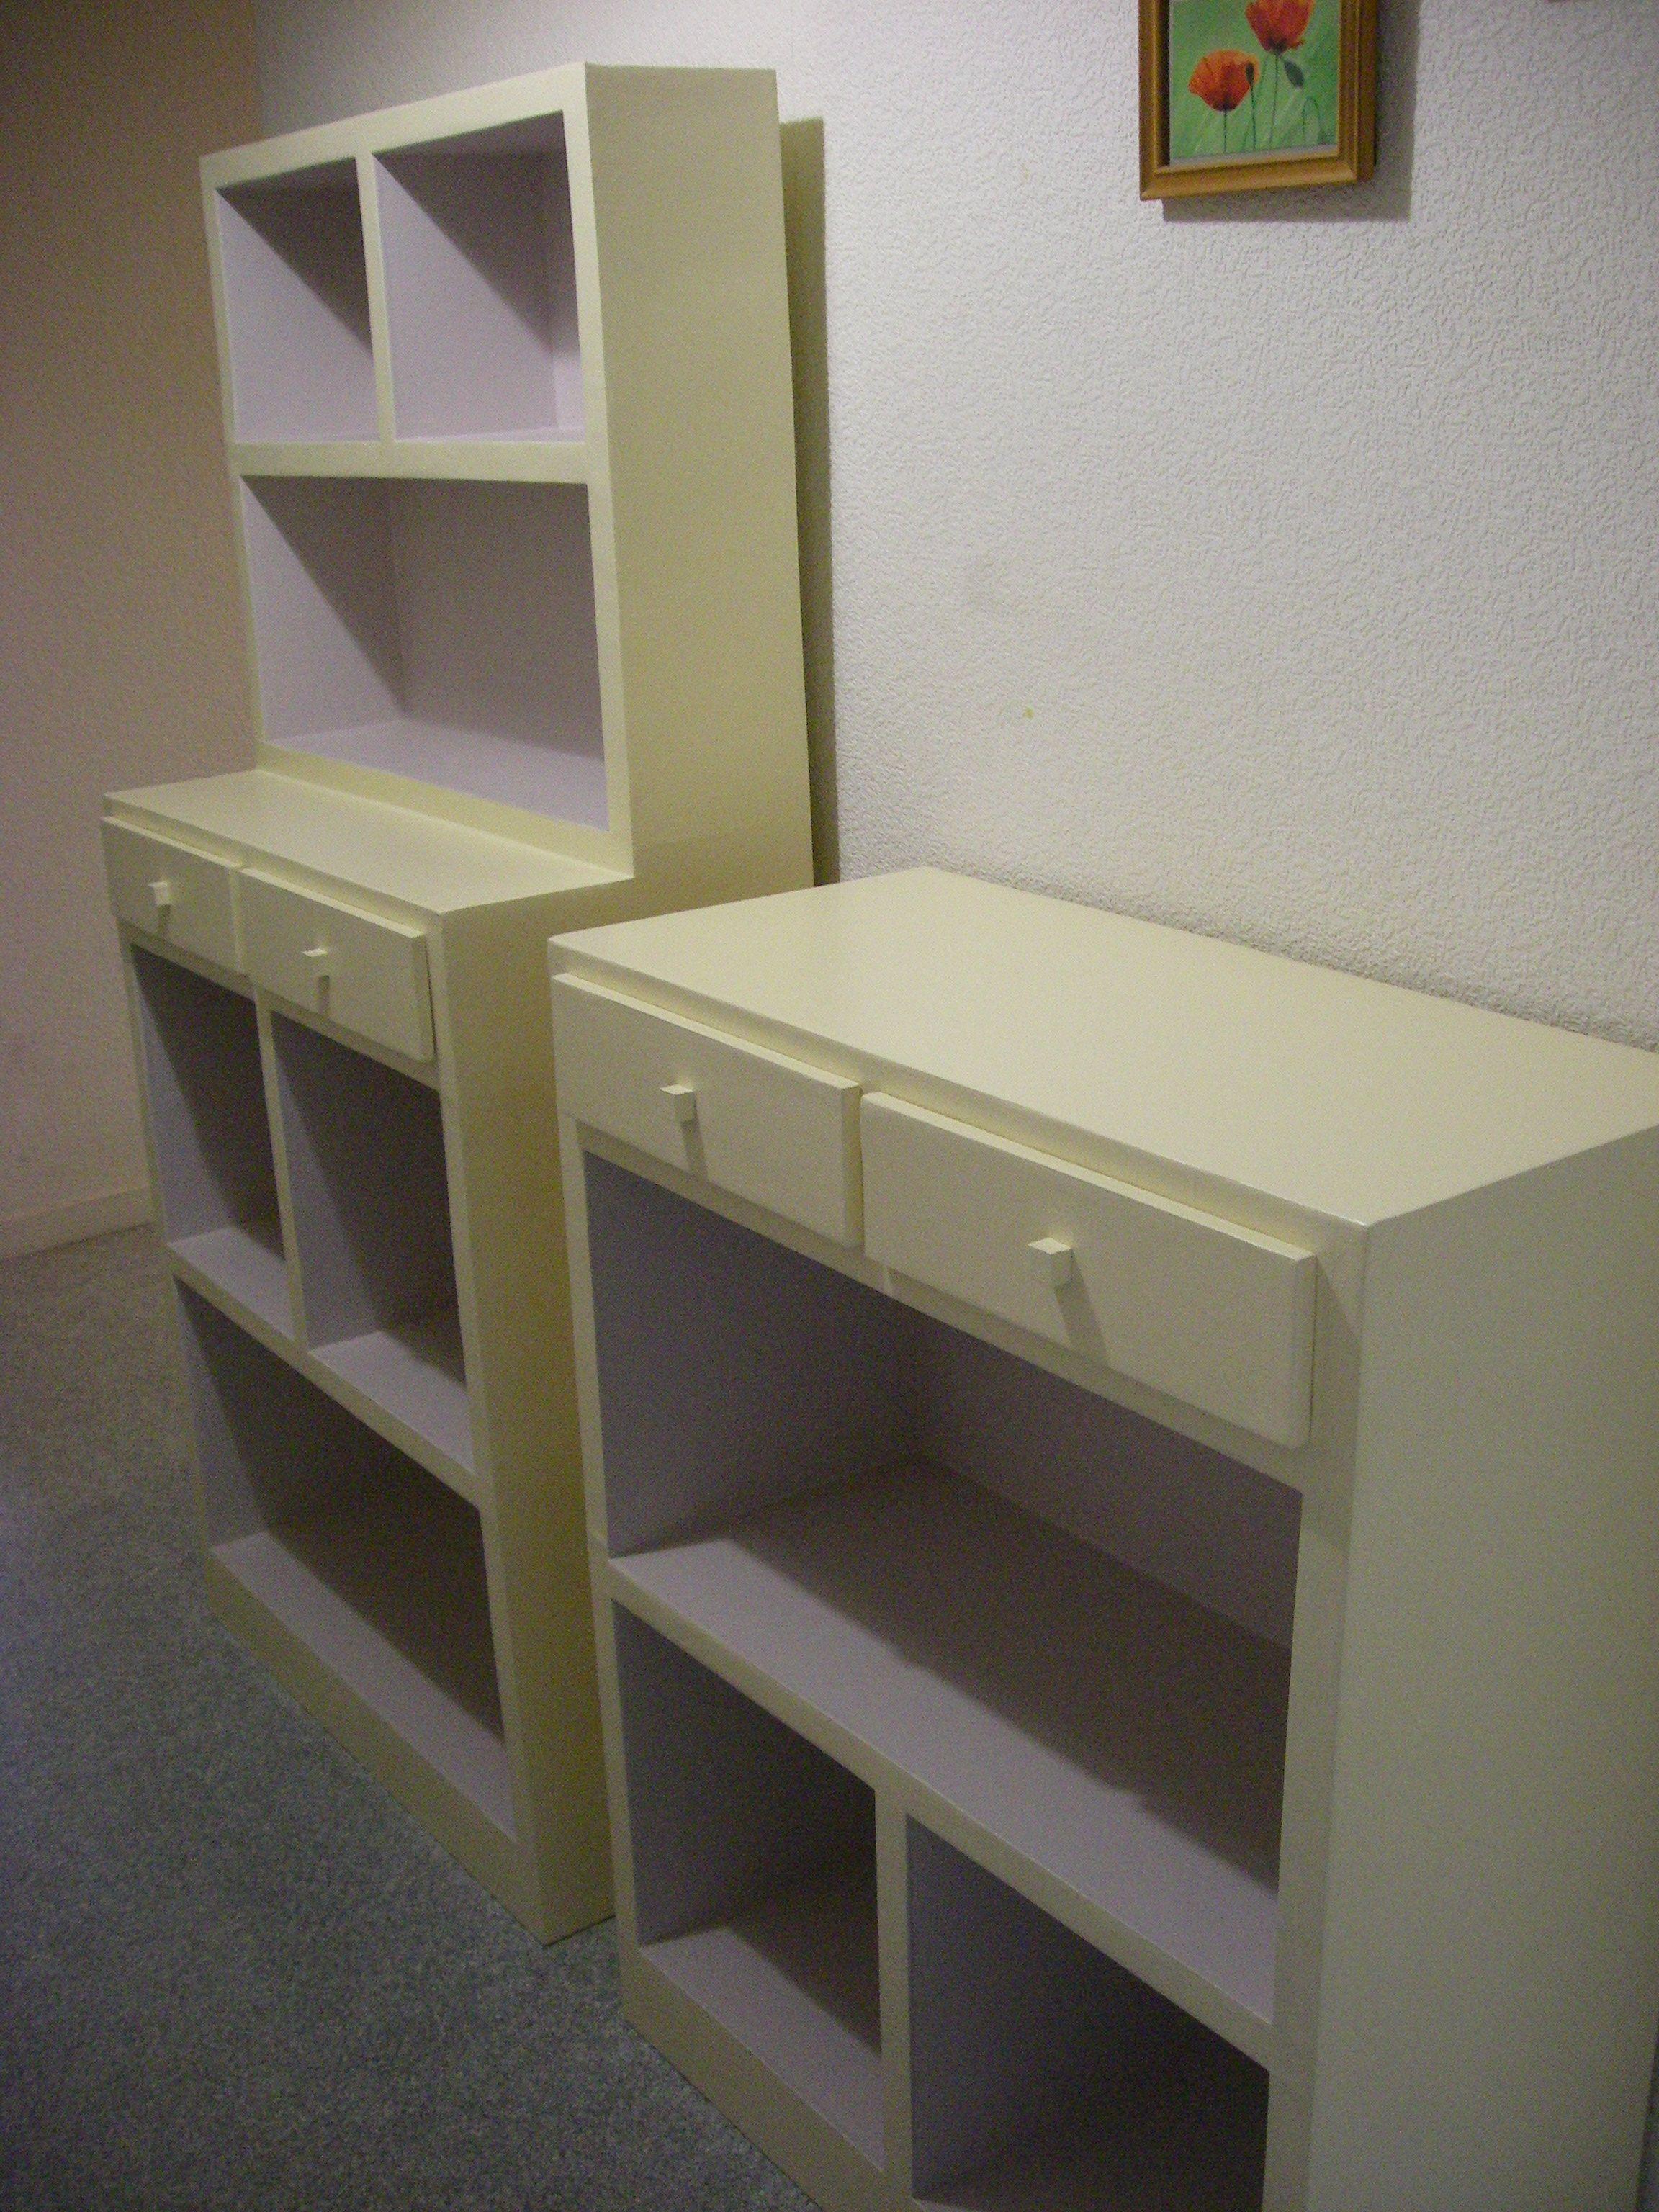 Accueil Meubles Carton Angers Mobilier De Salon Meuble Rangement Bureau Meubles En Carton